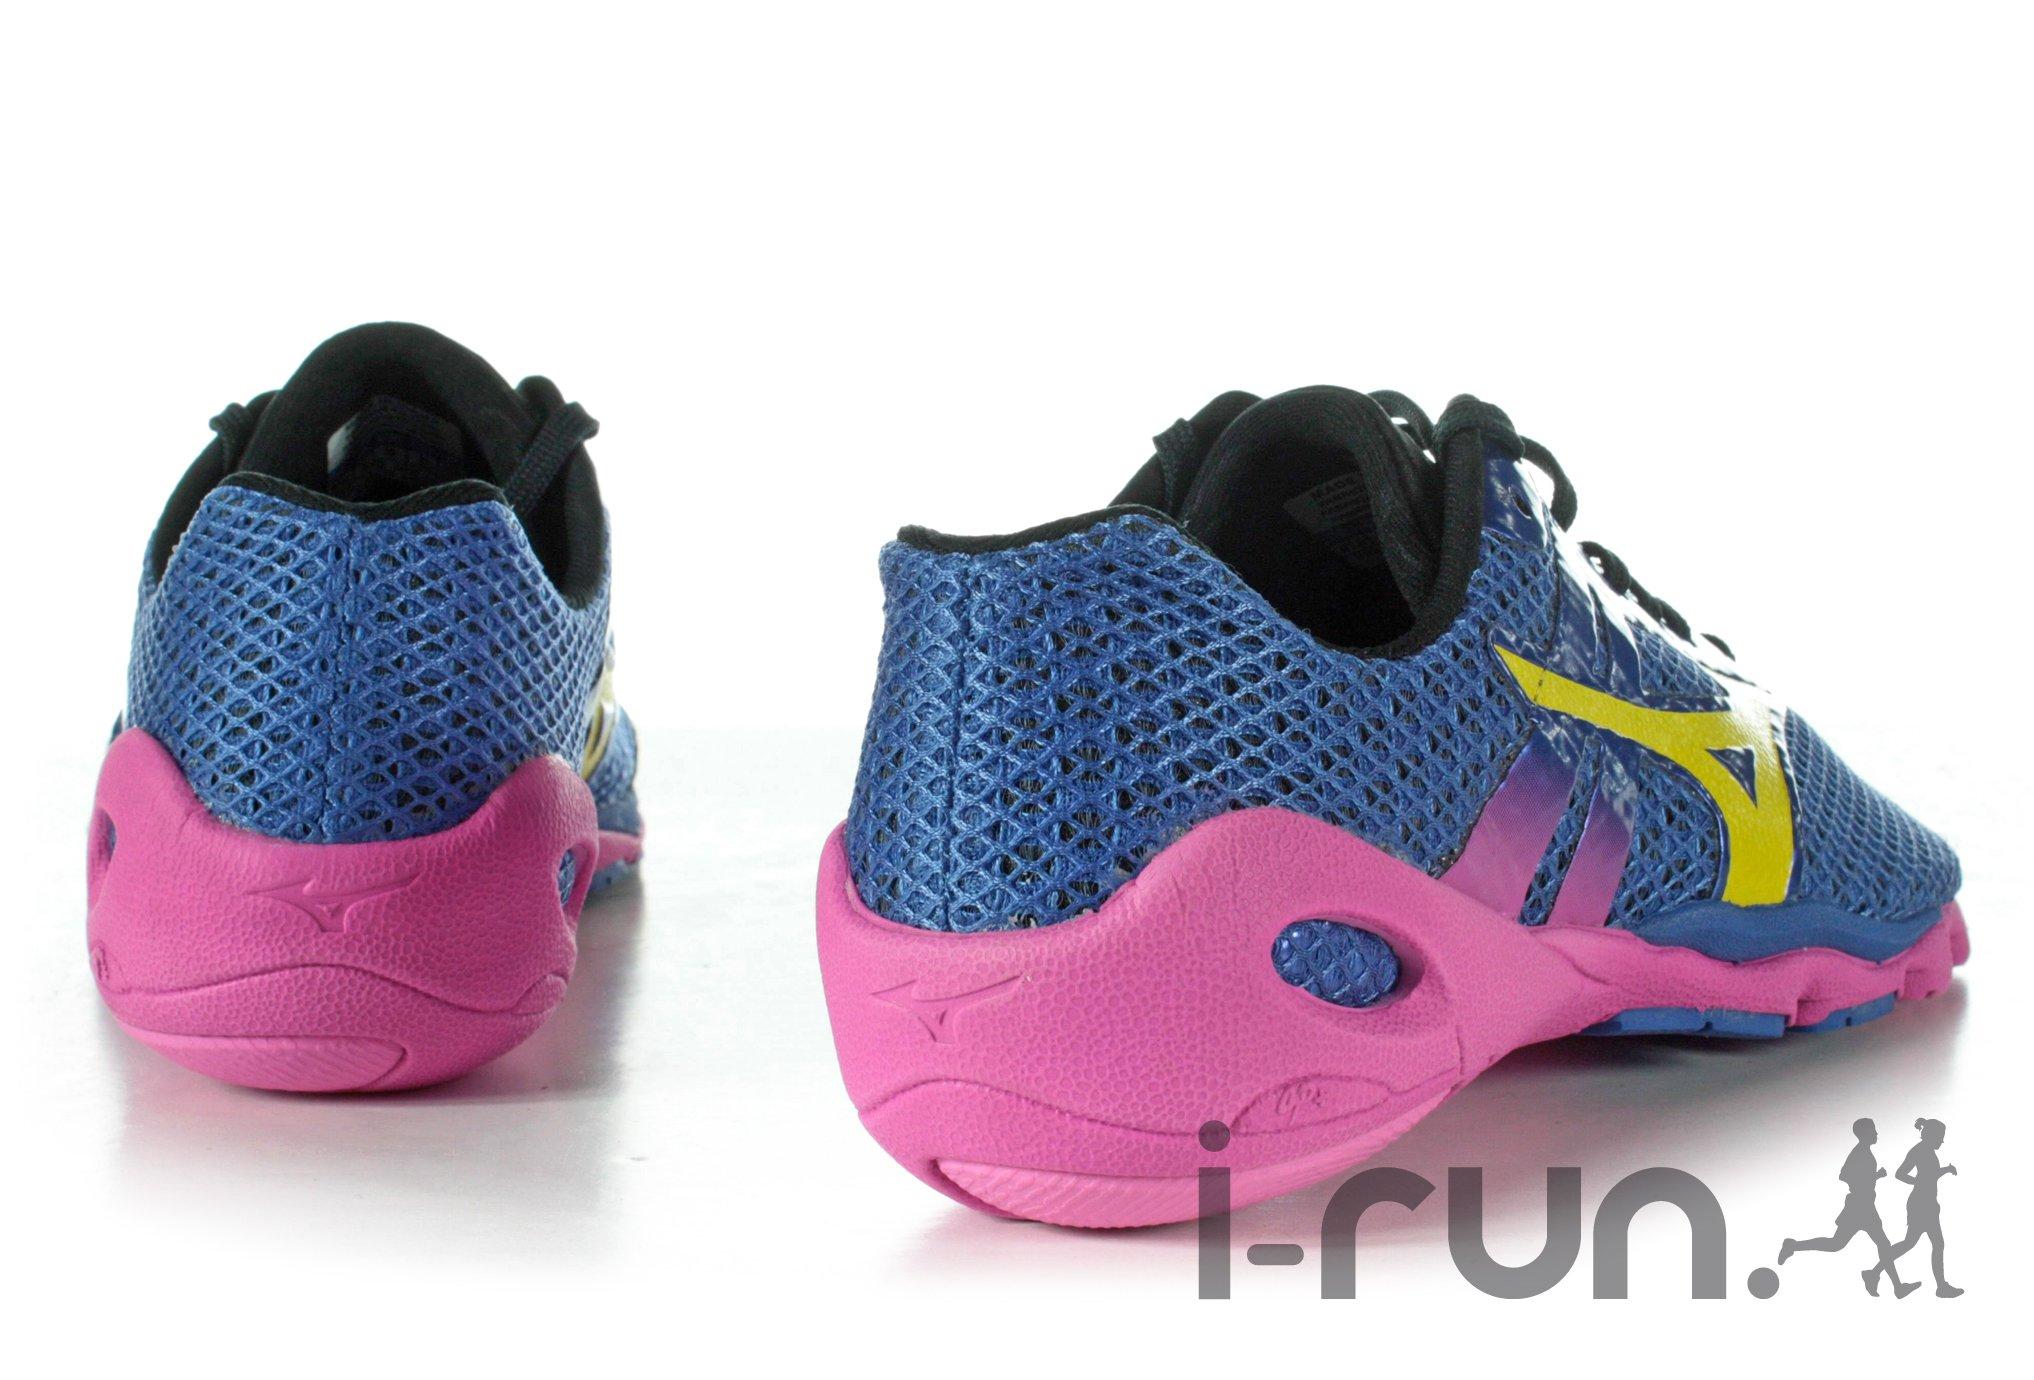 meilleure sélection bad91 2abfe chaussure Chaussure Asics De Supination Pied Running qUMGLpjzSV